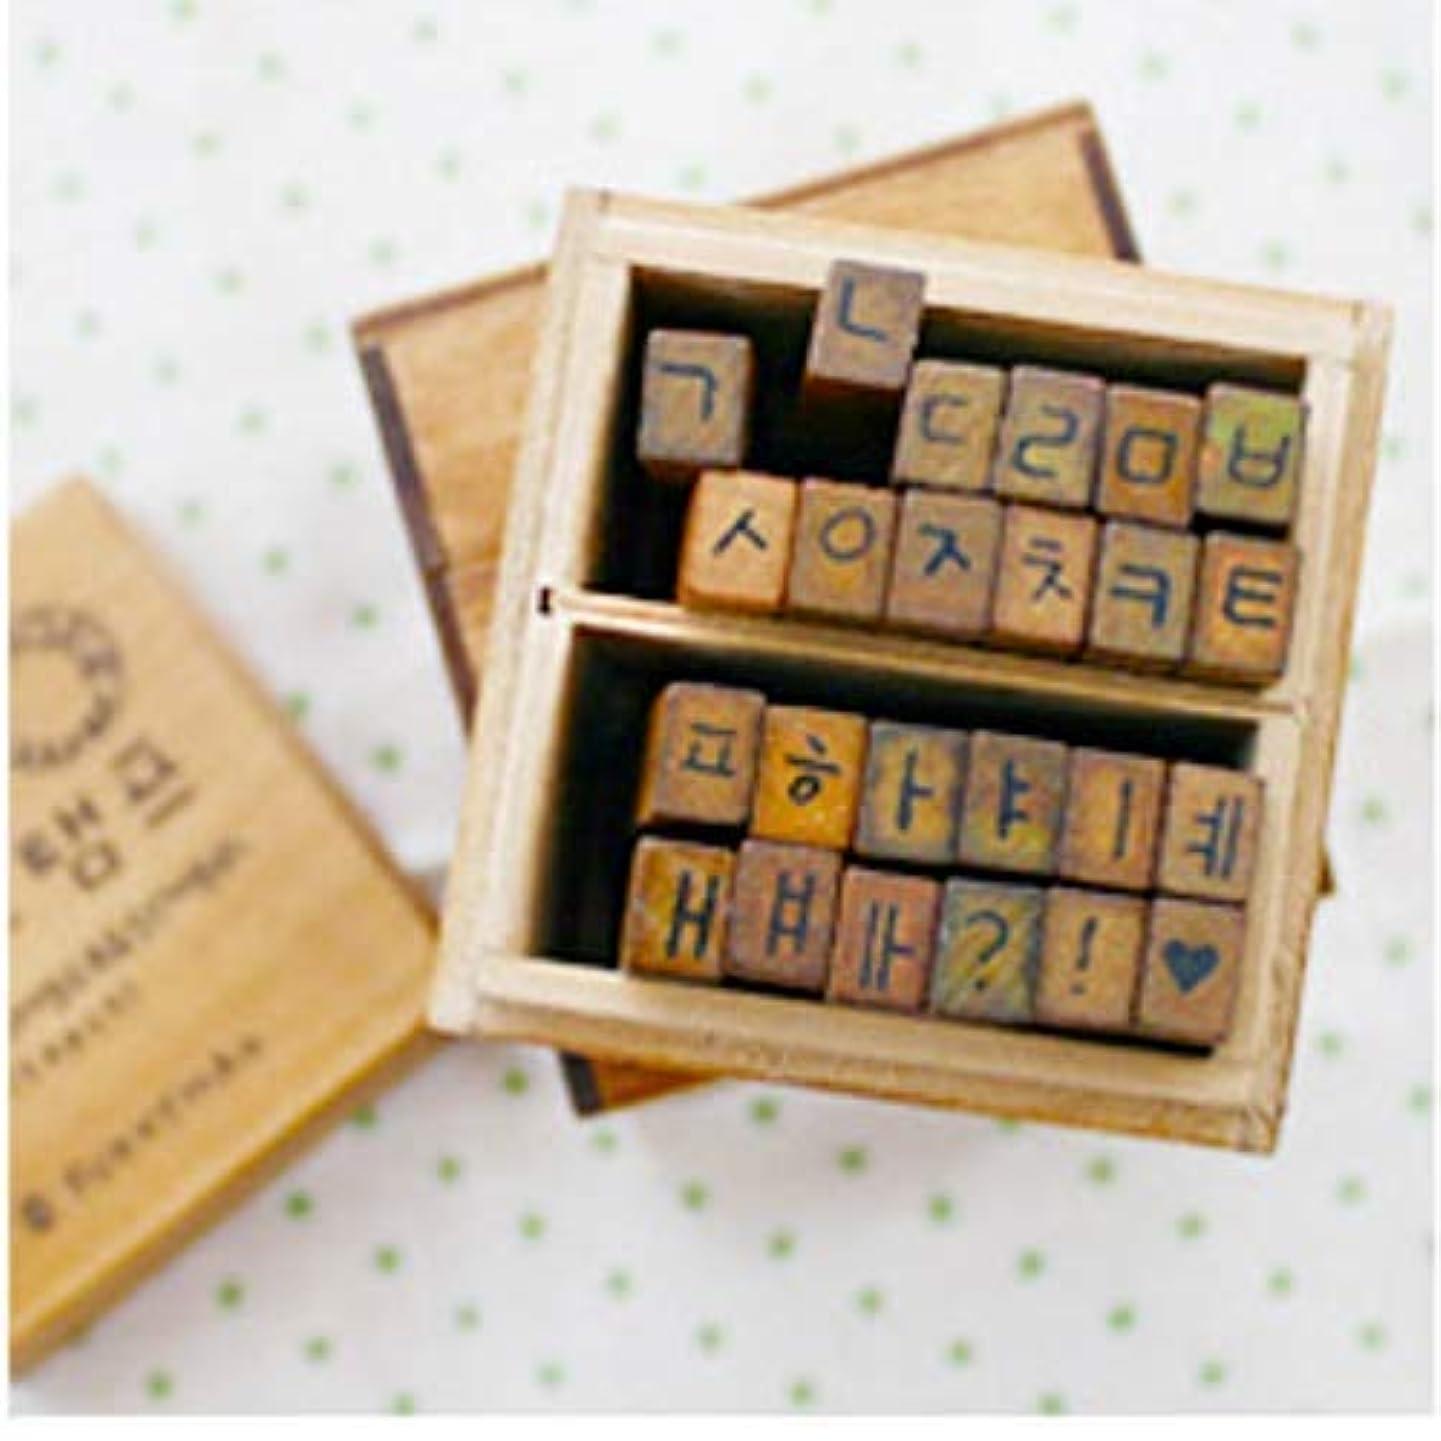 Korean Alphabet (Hangul Set 2) Rubber Stamp Letters ?? ??? Characters Wooden Box Vintage Antique Finish - DIY